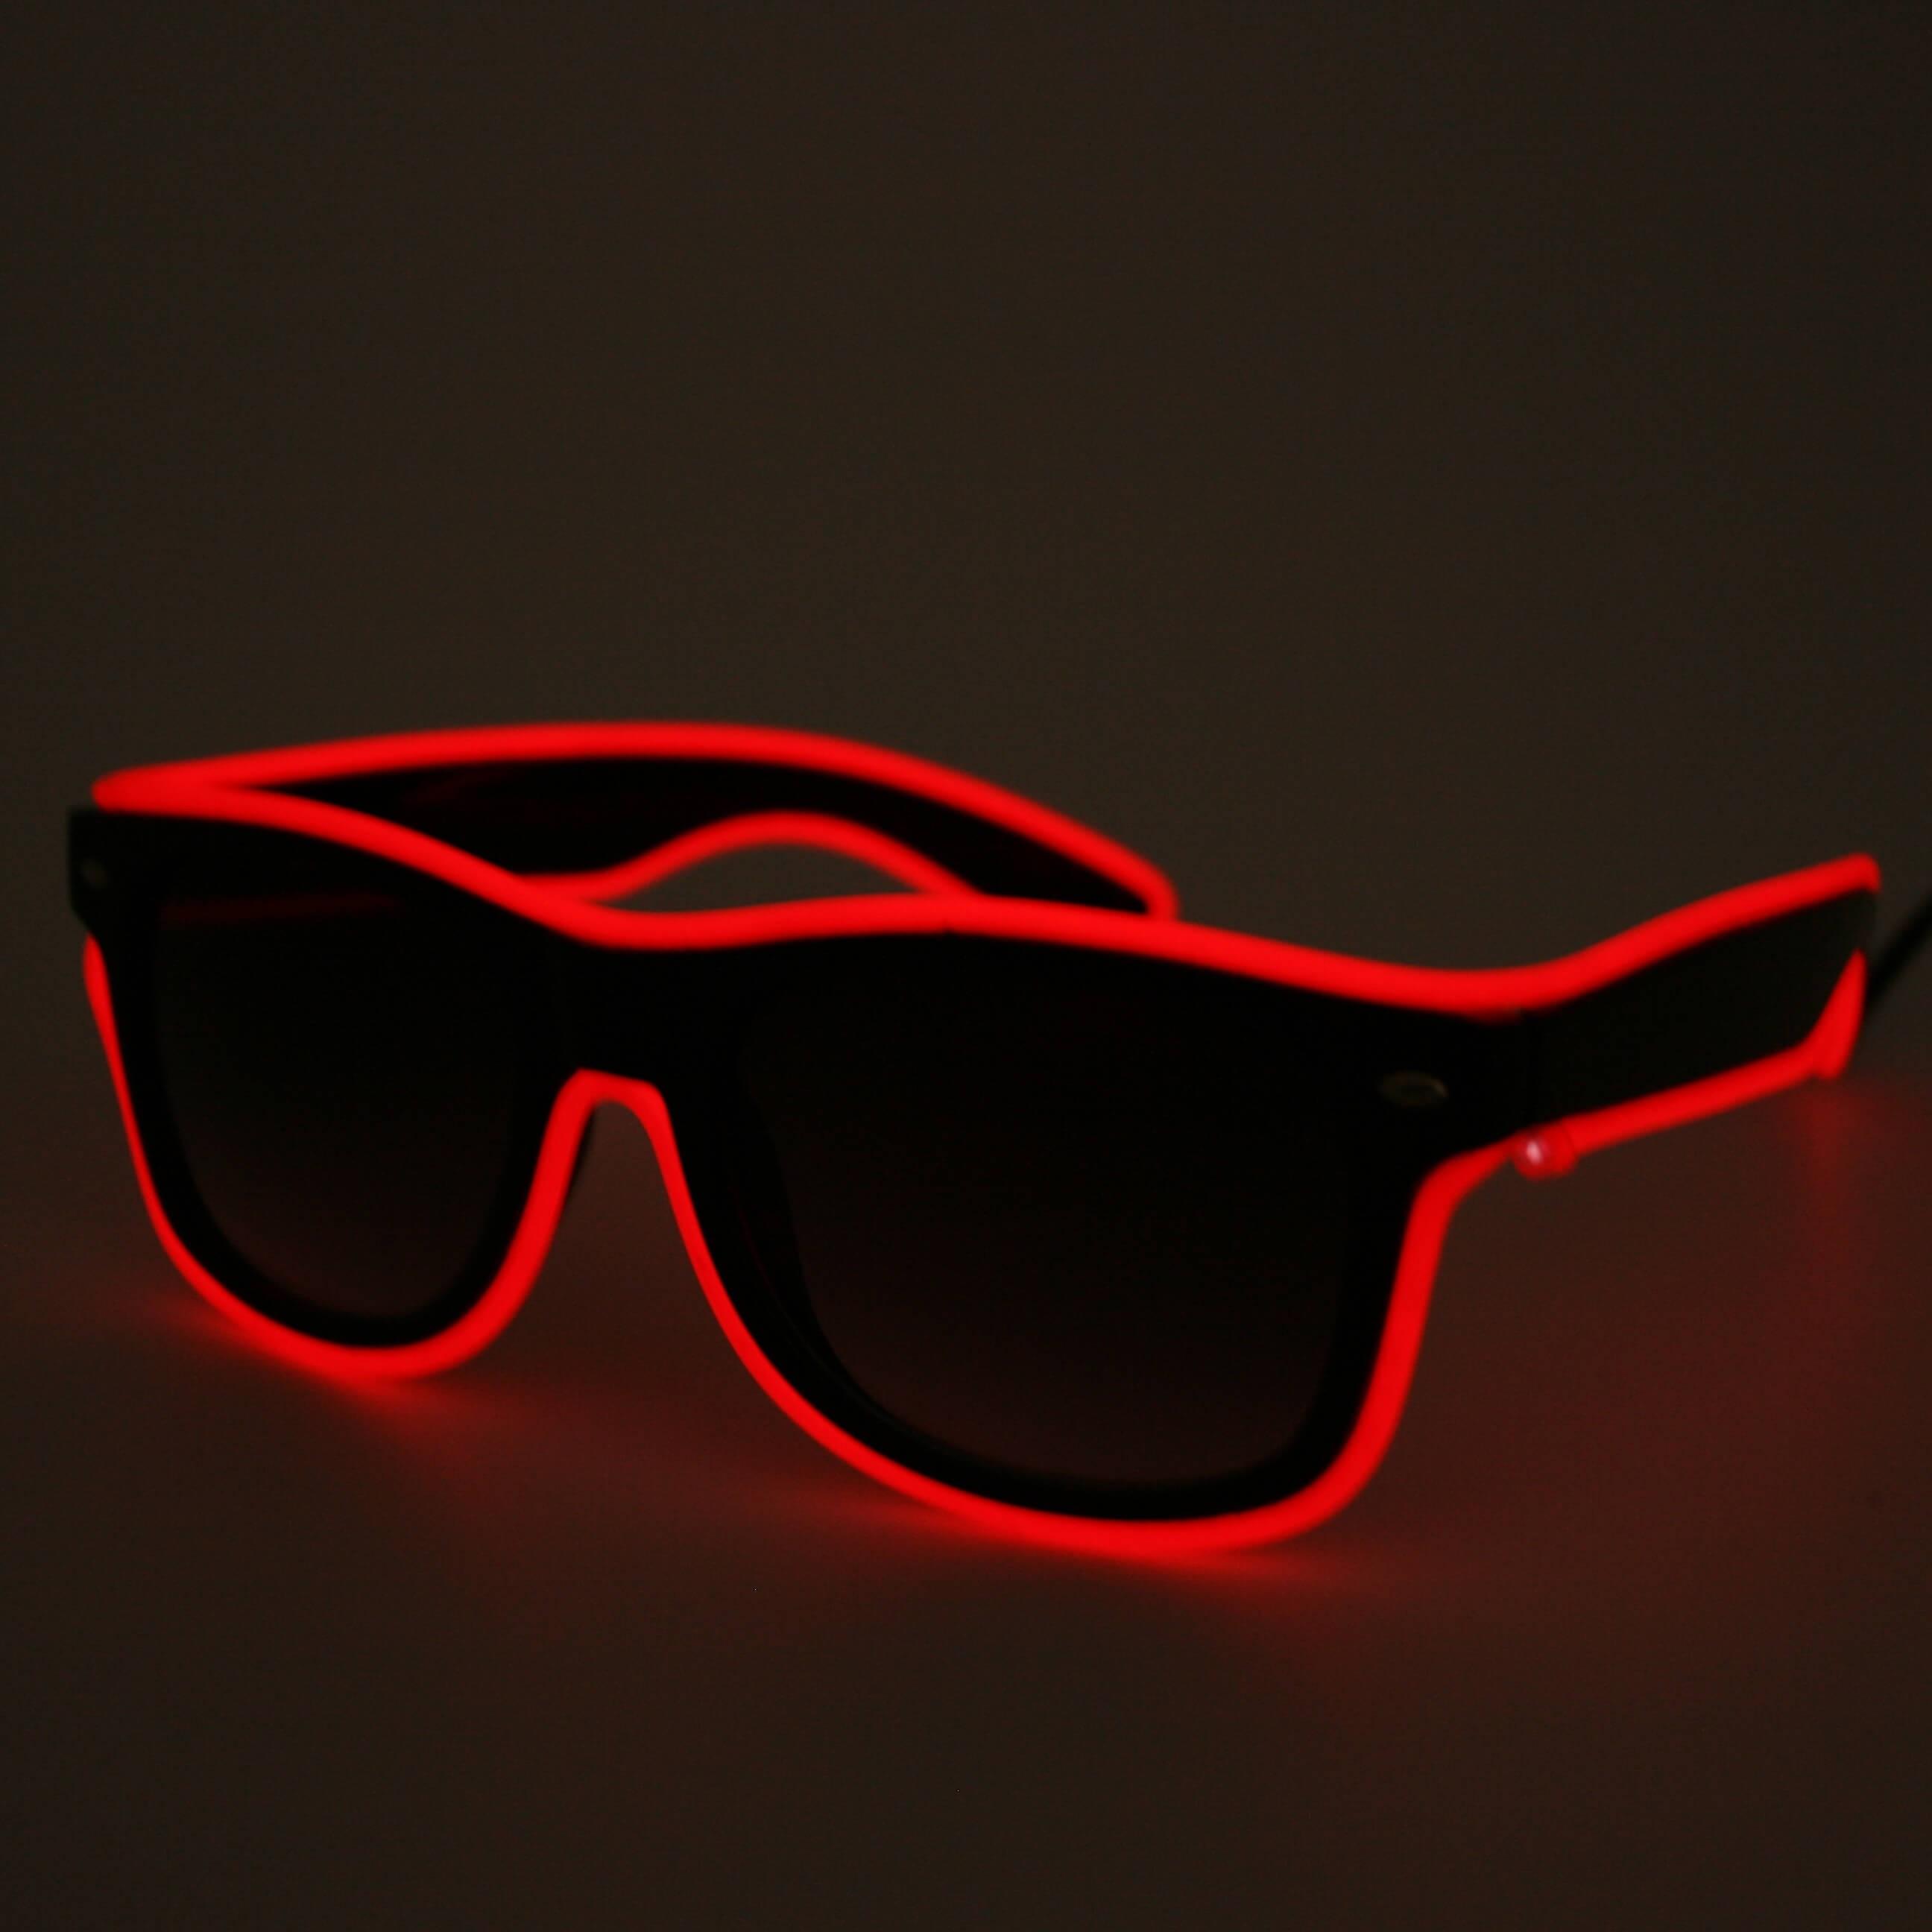 LED Neon Glasses Red